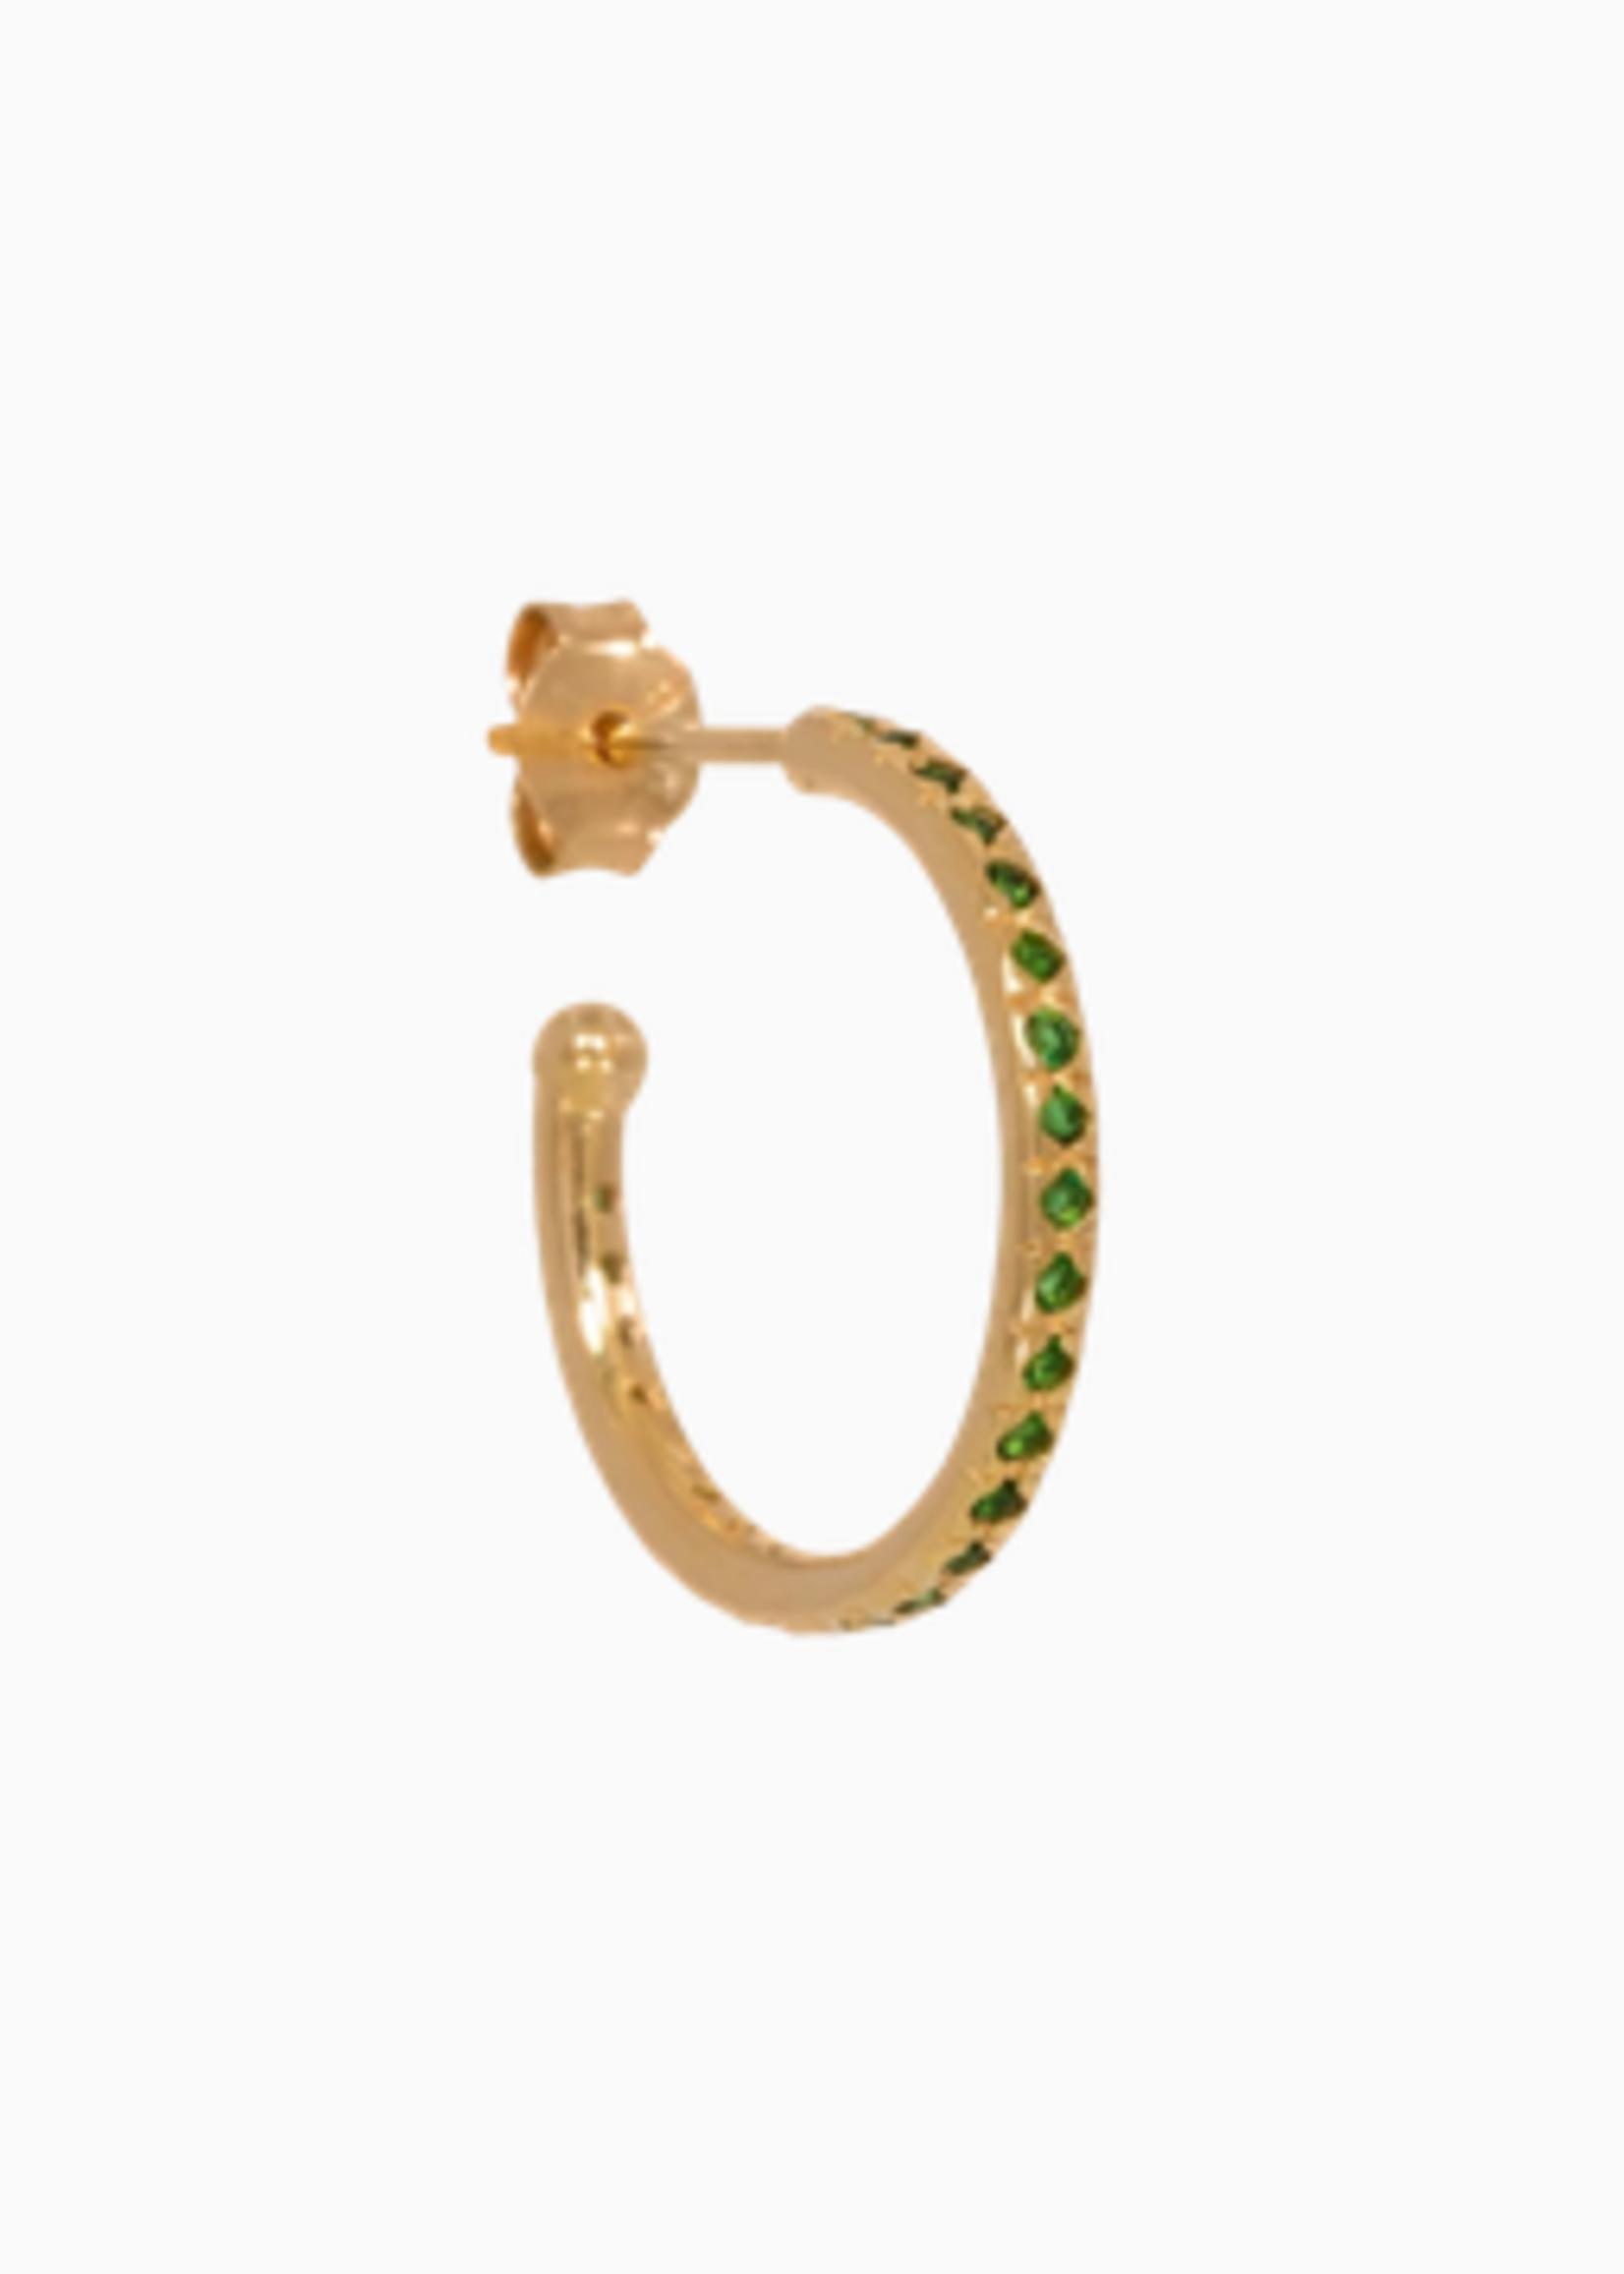 Eline Rosina Mix & Match single large emerald hoop gold plated